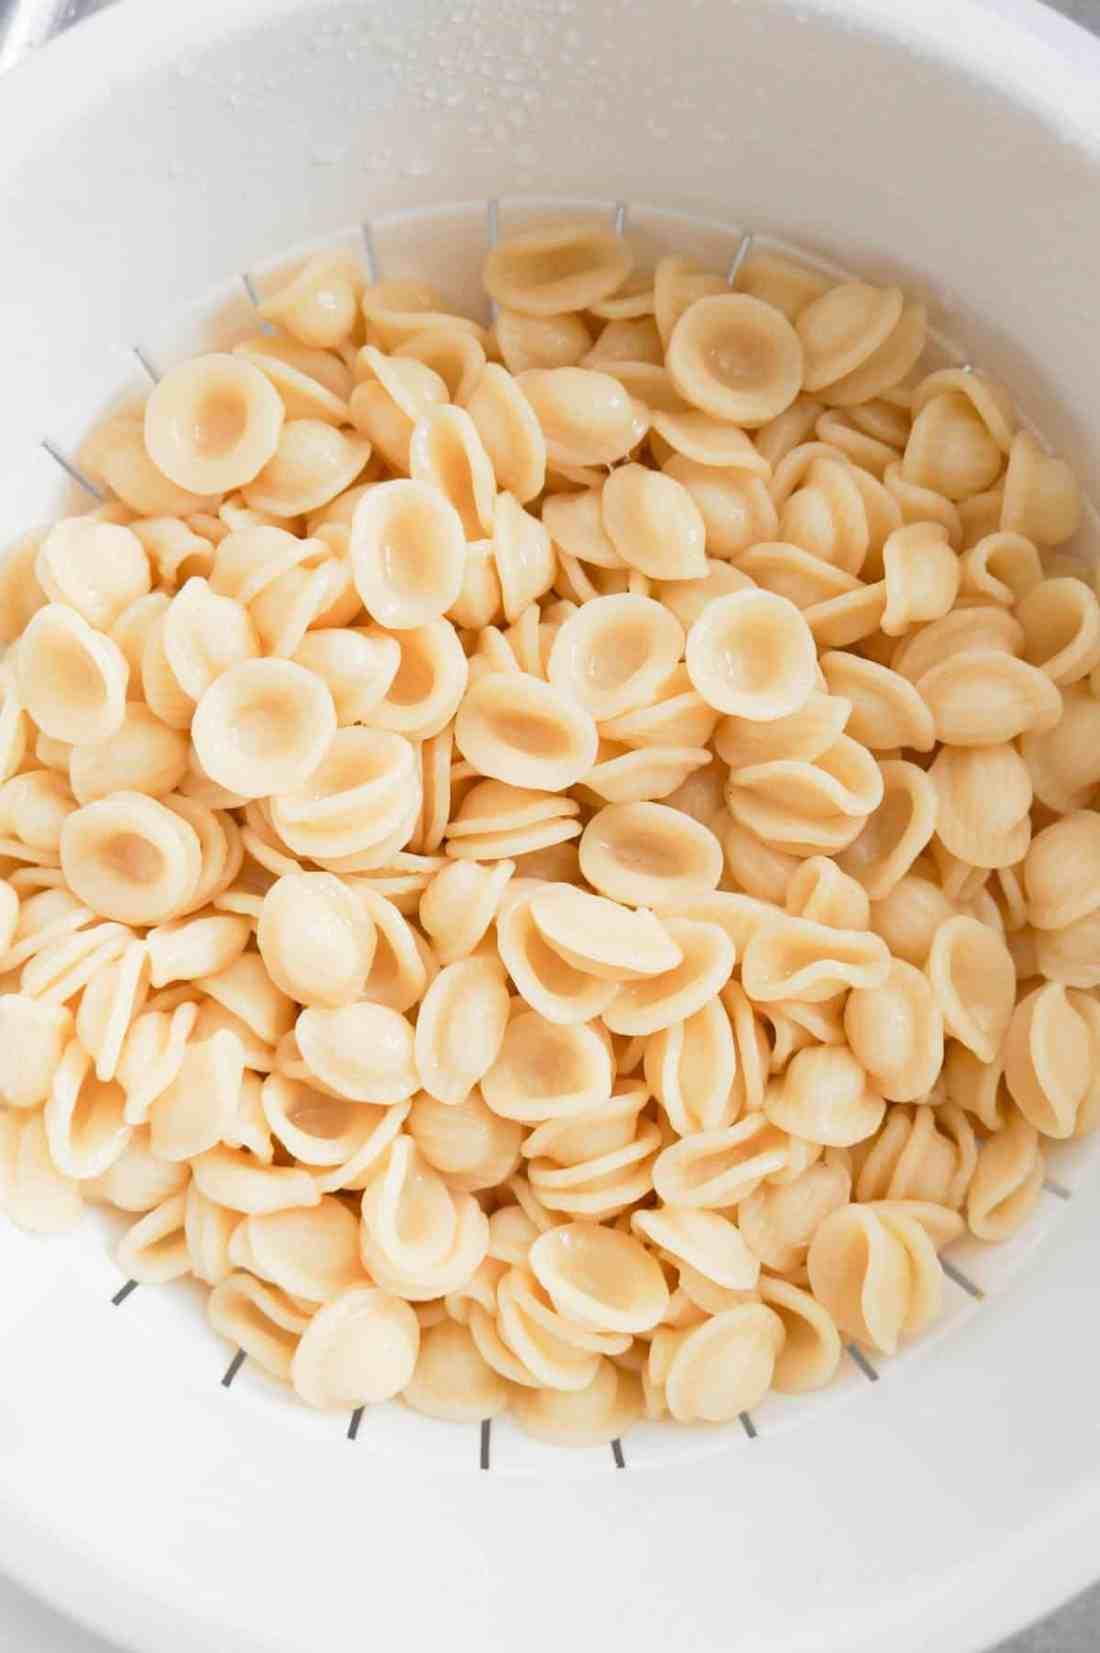 cooked orecchiette noodles in a strainer